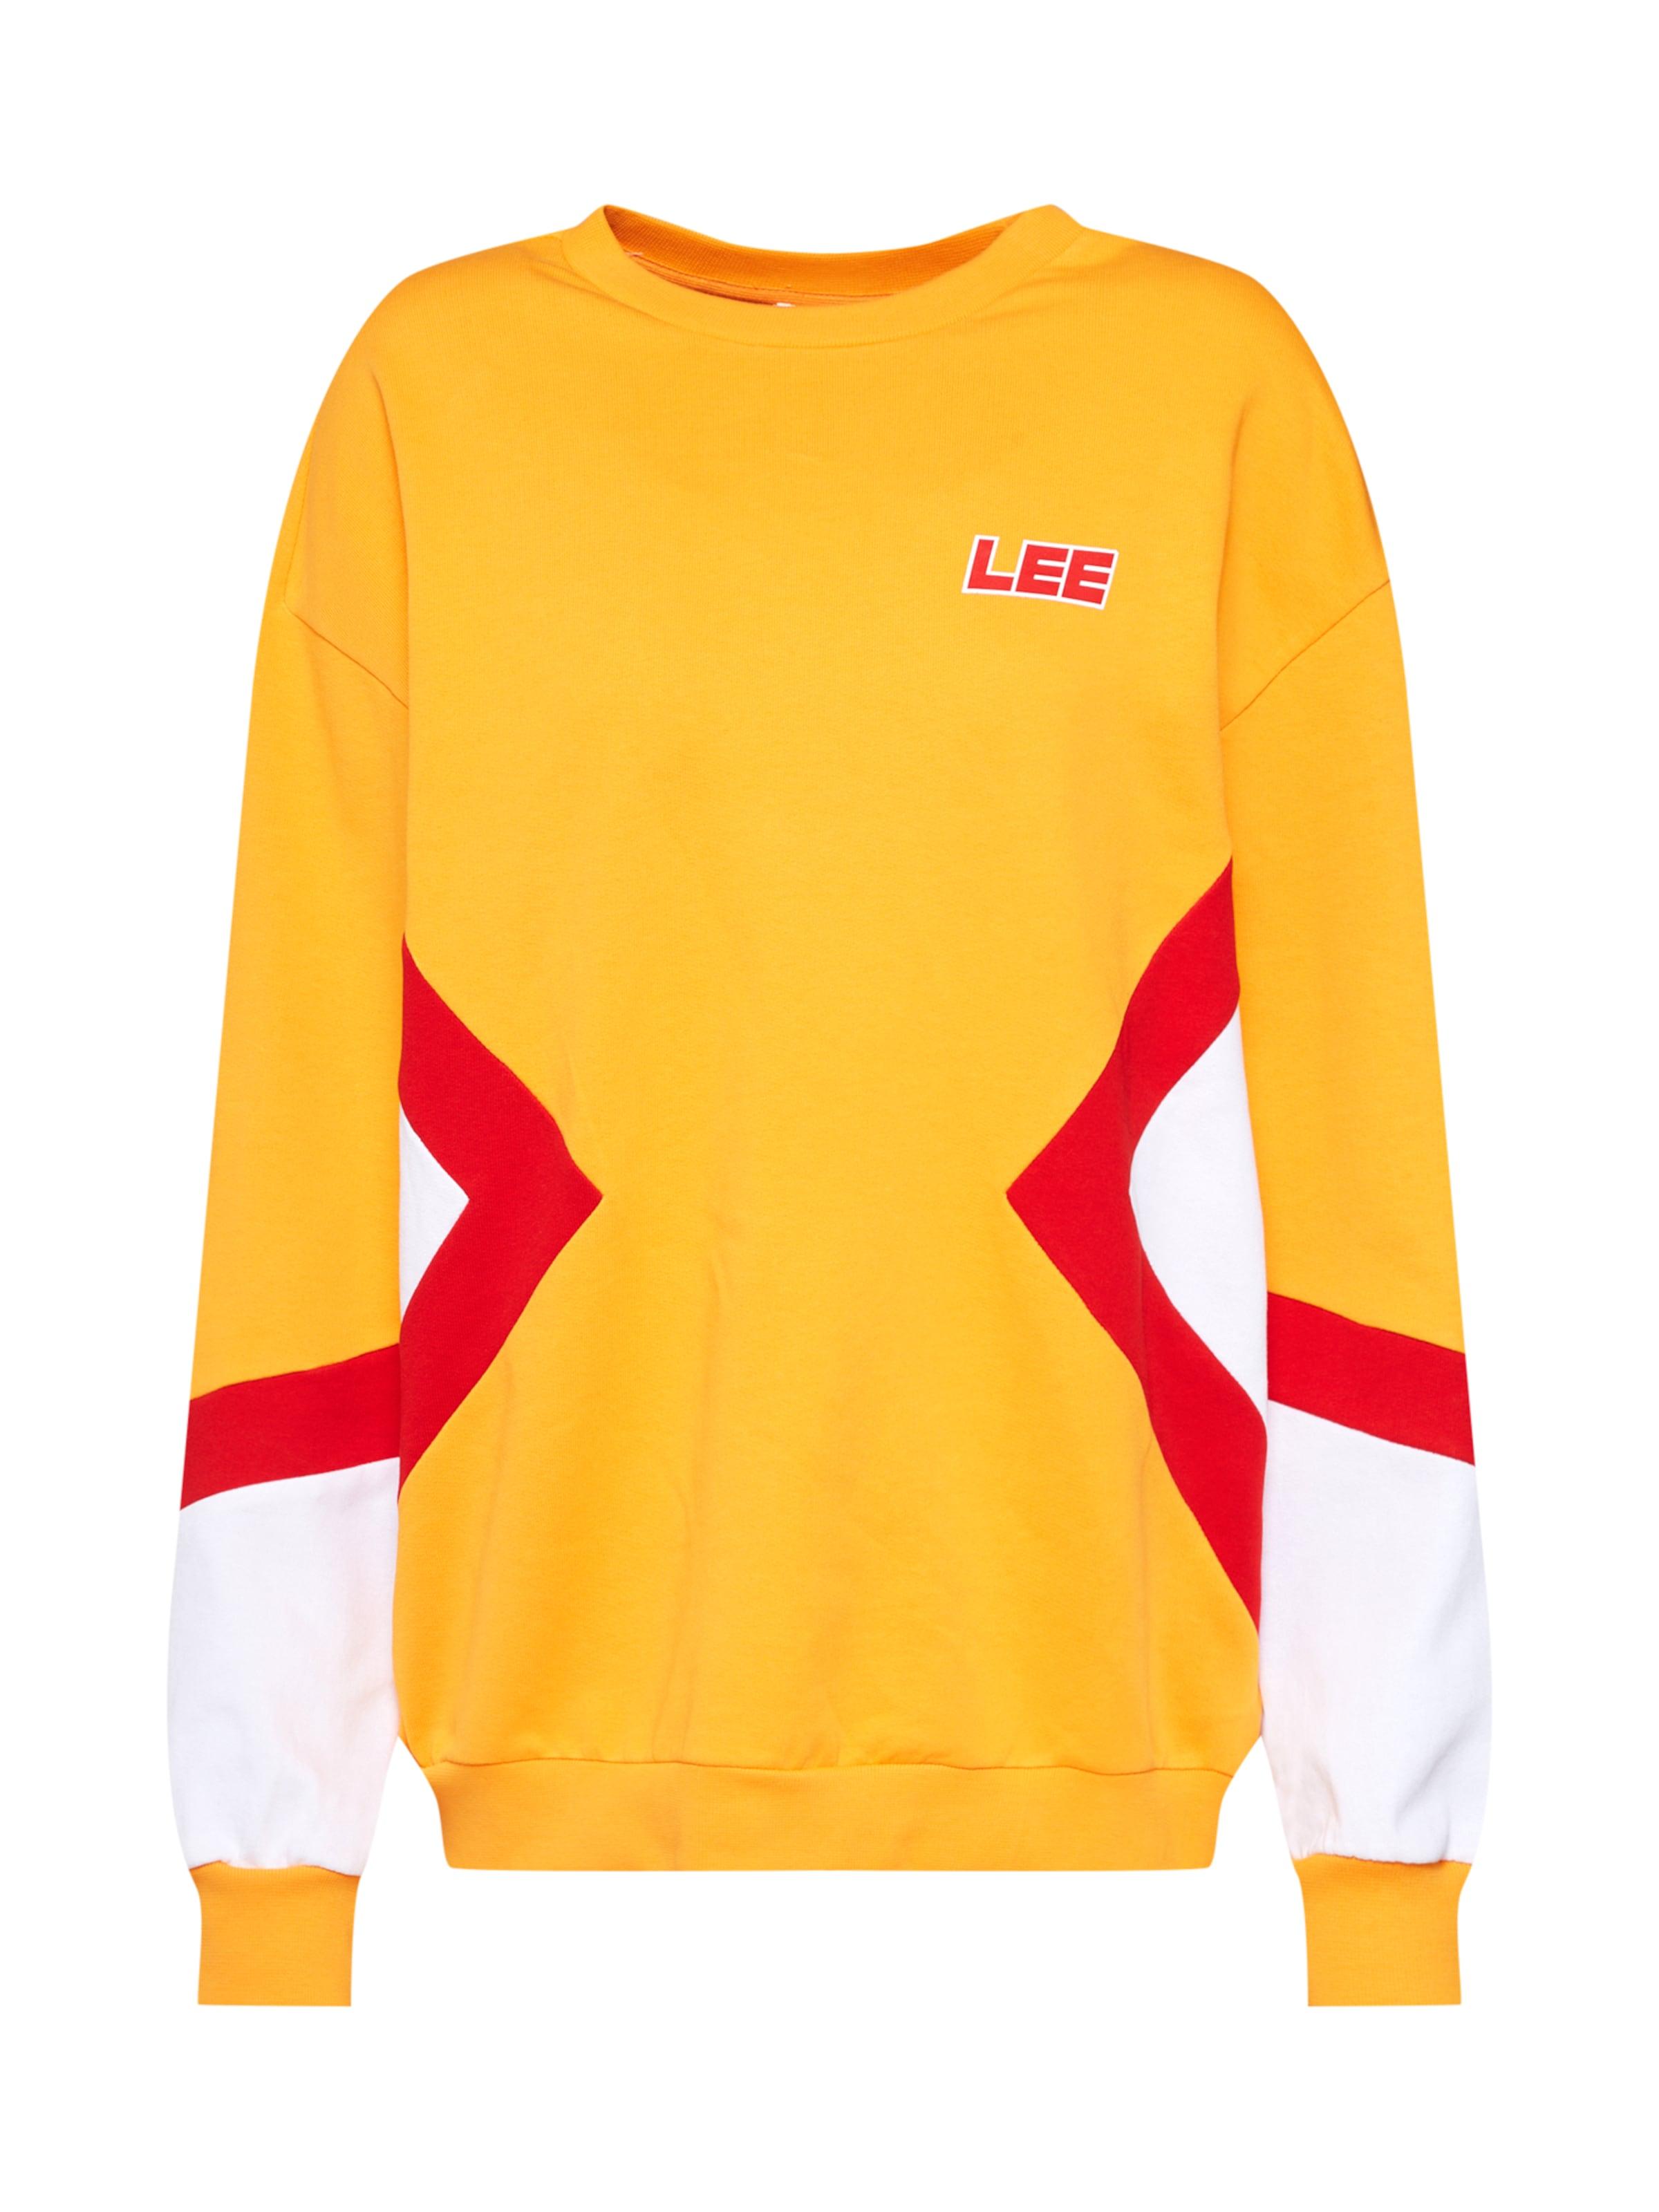 Jaune En Lee Sweat D'orRouge shirt Blanc 'seasonal Sws' Clair L54ARj3